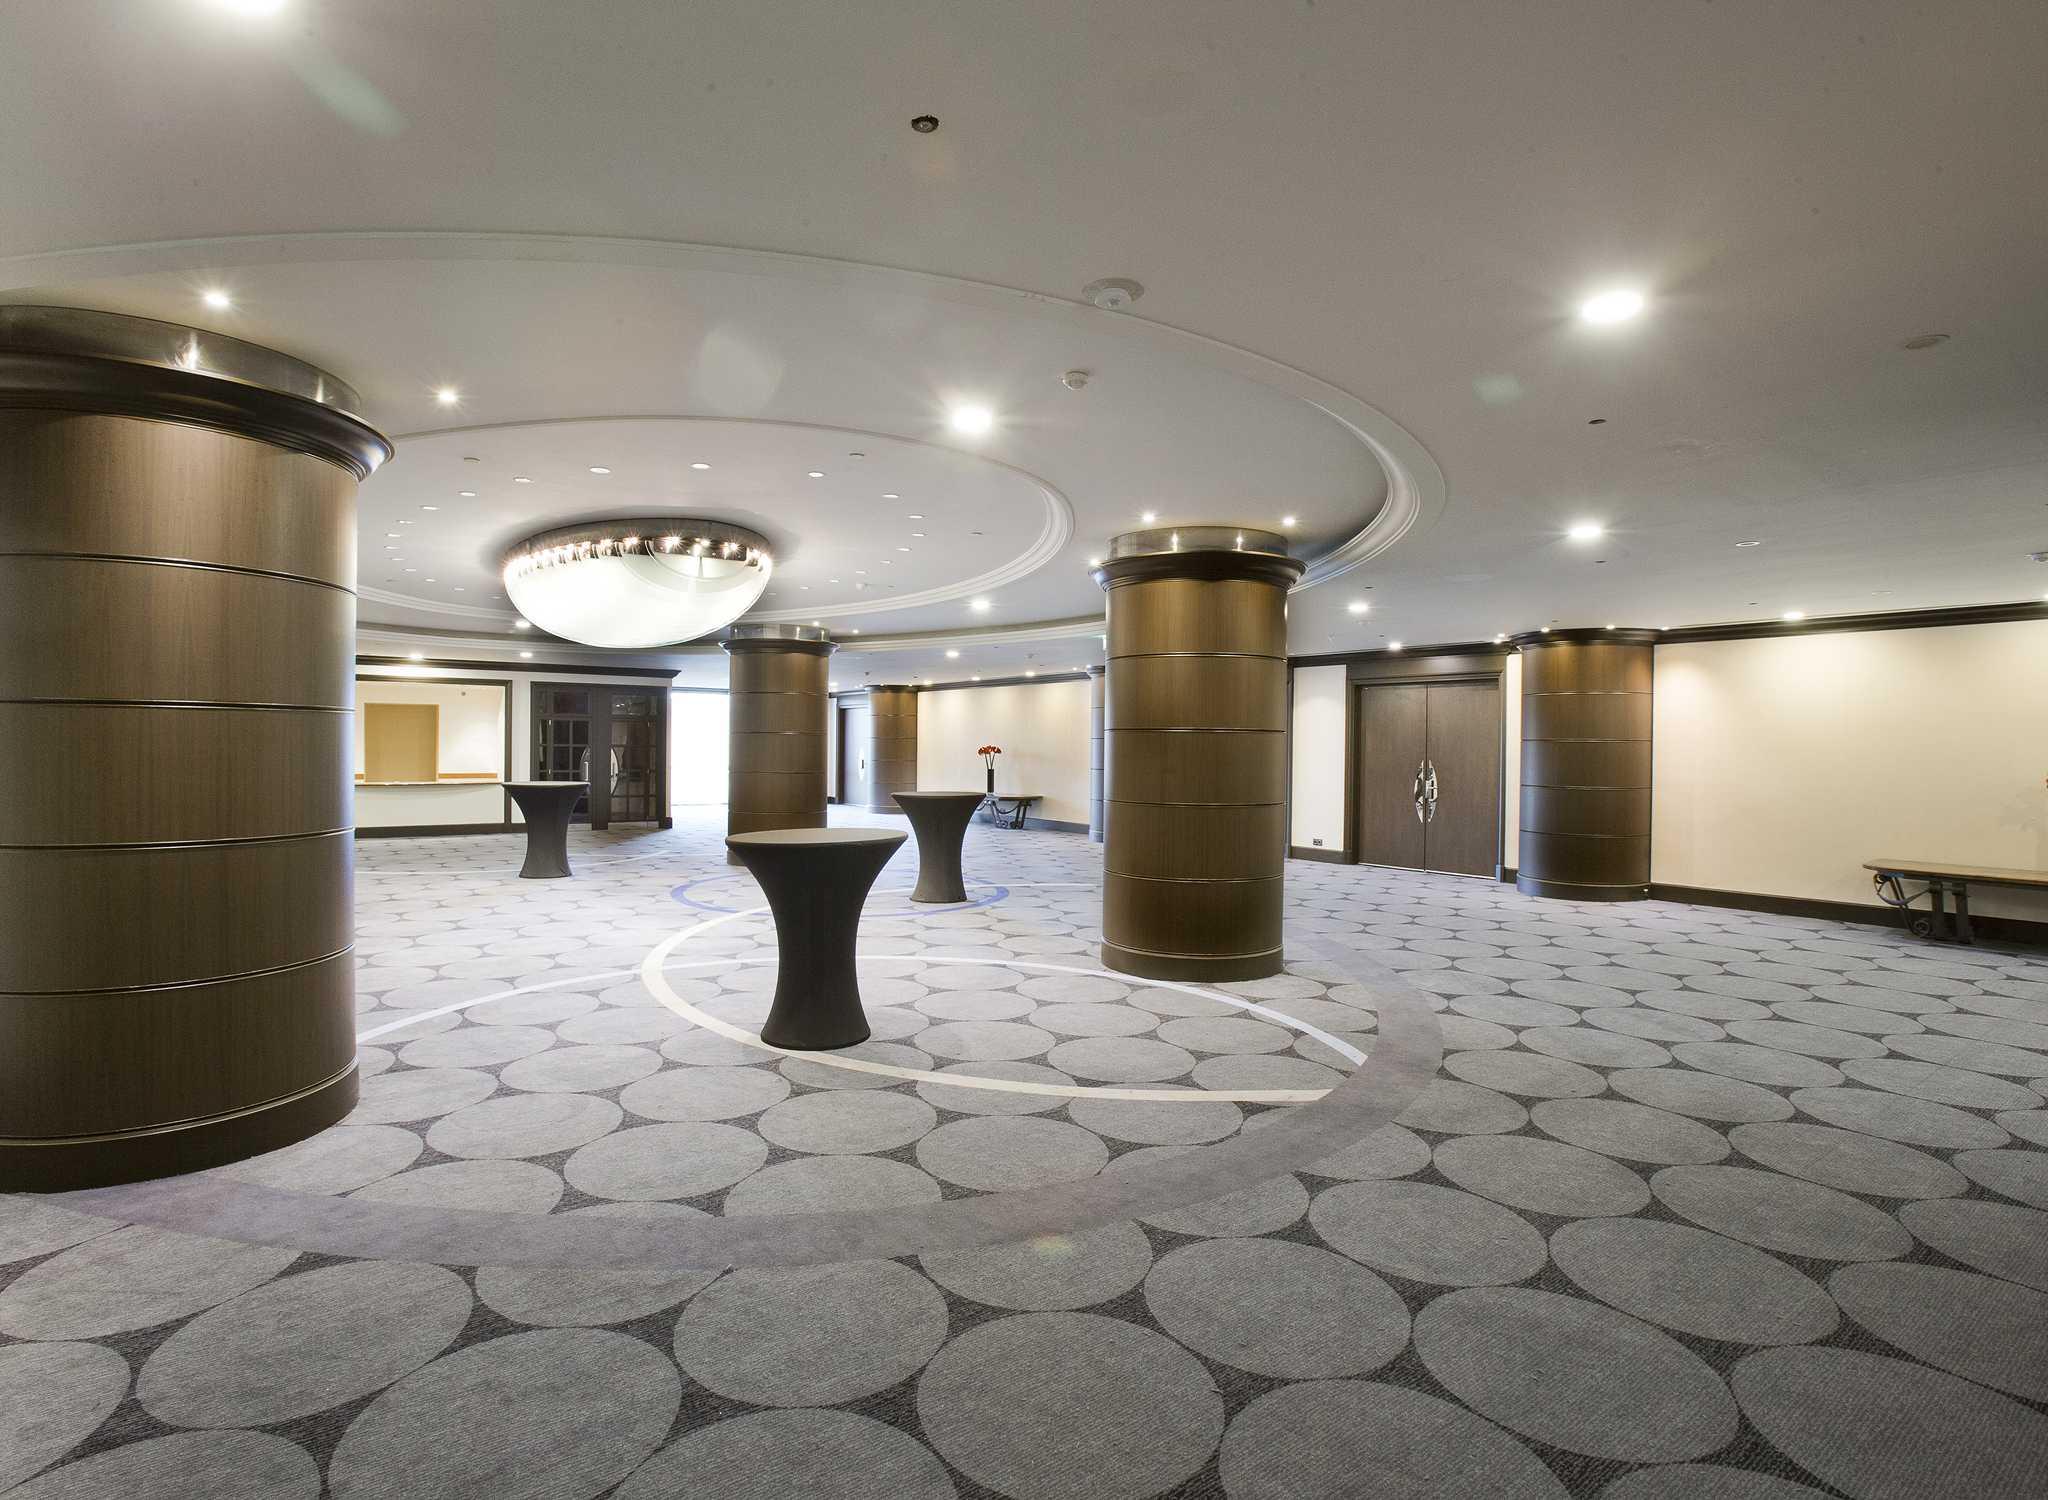 Roissy Hotels Hilton Paris Charles De Gaulle Airport Hotel